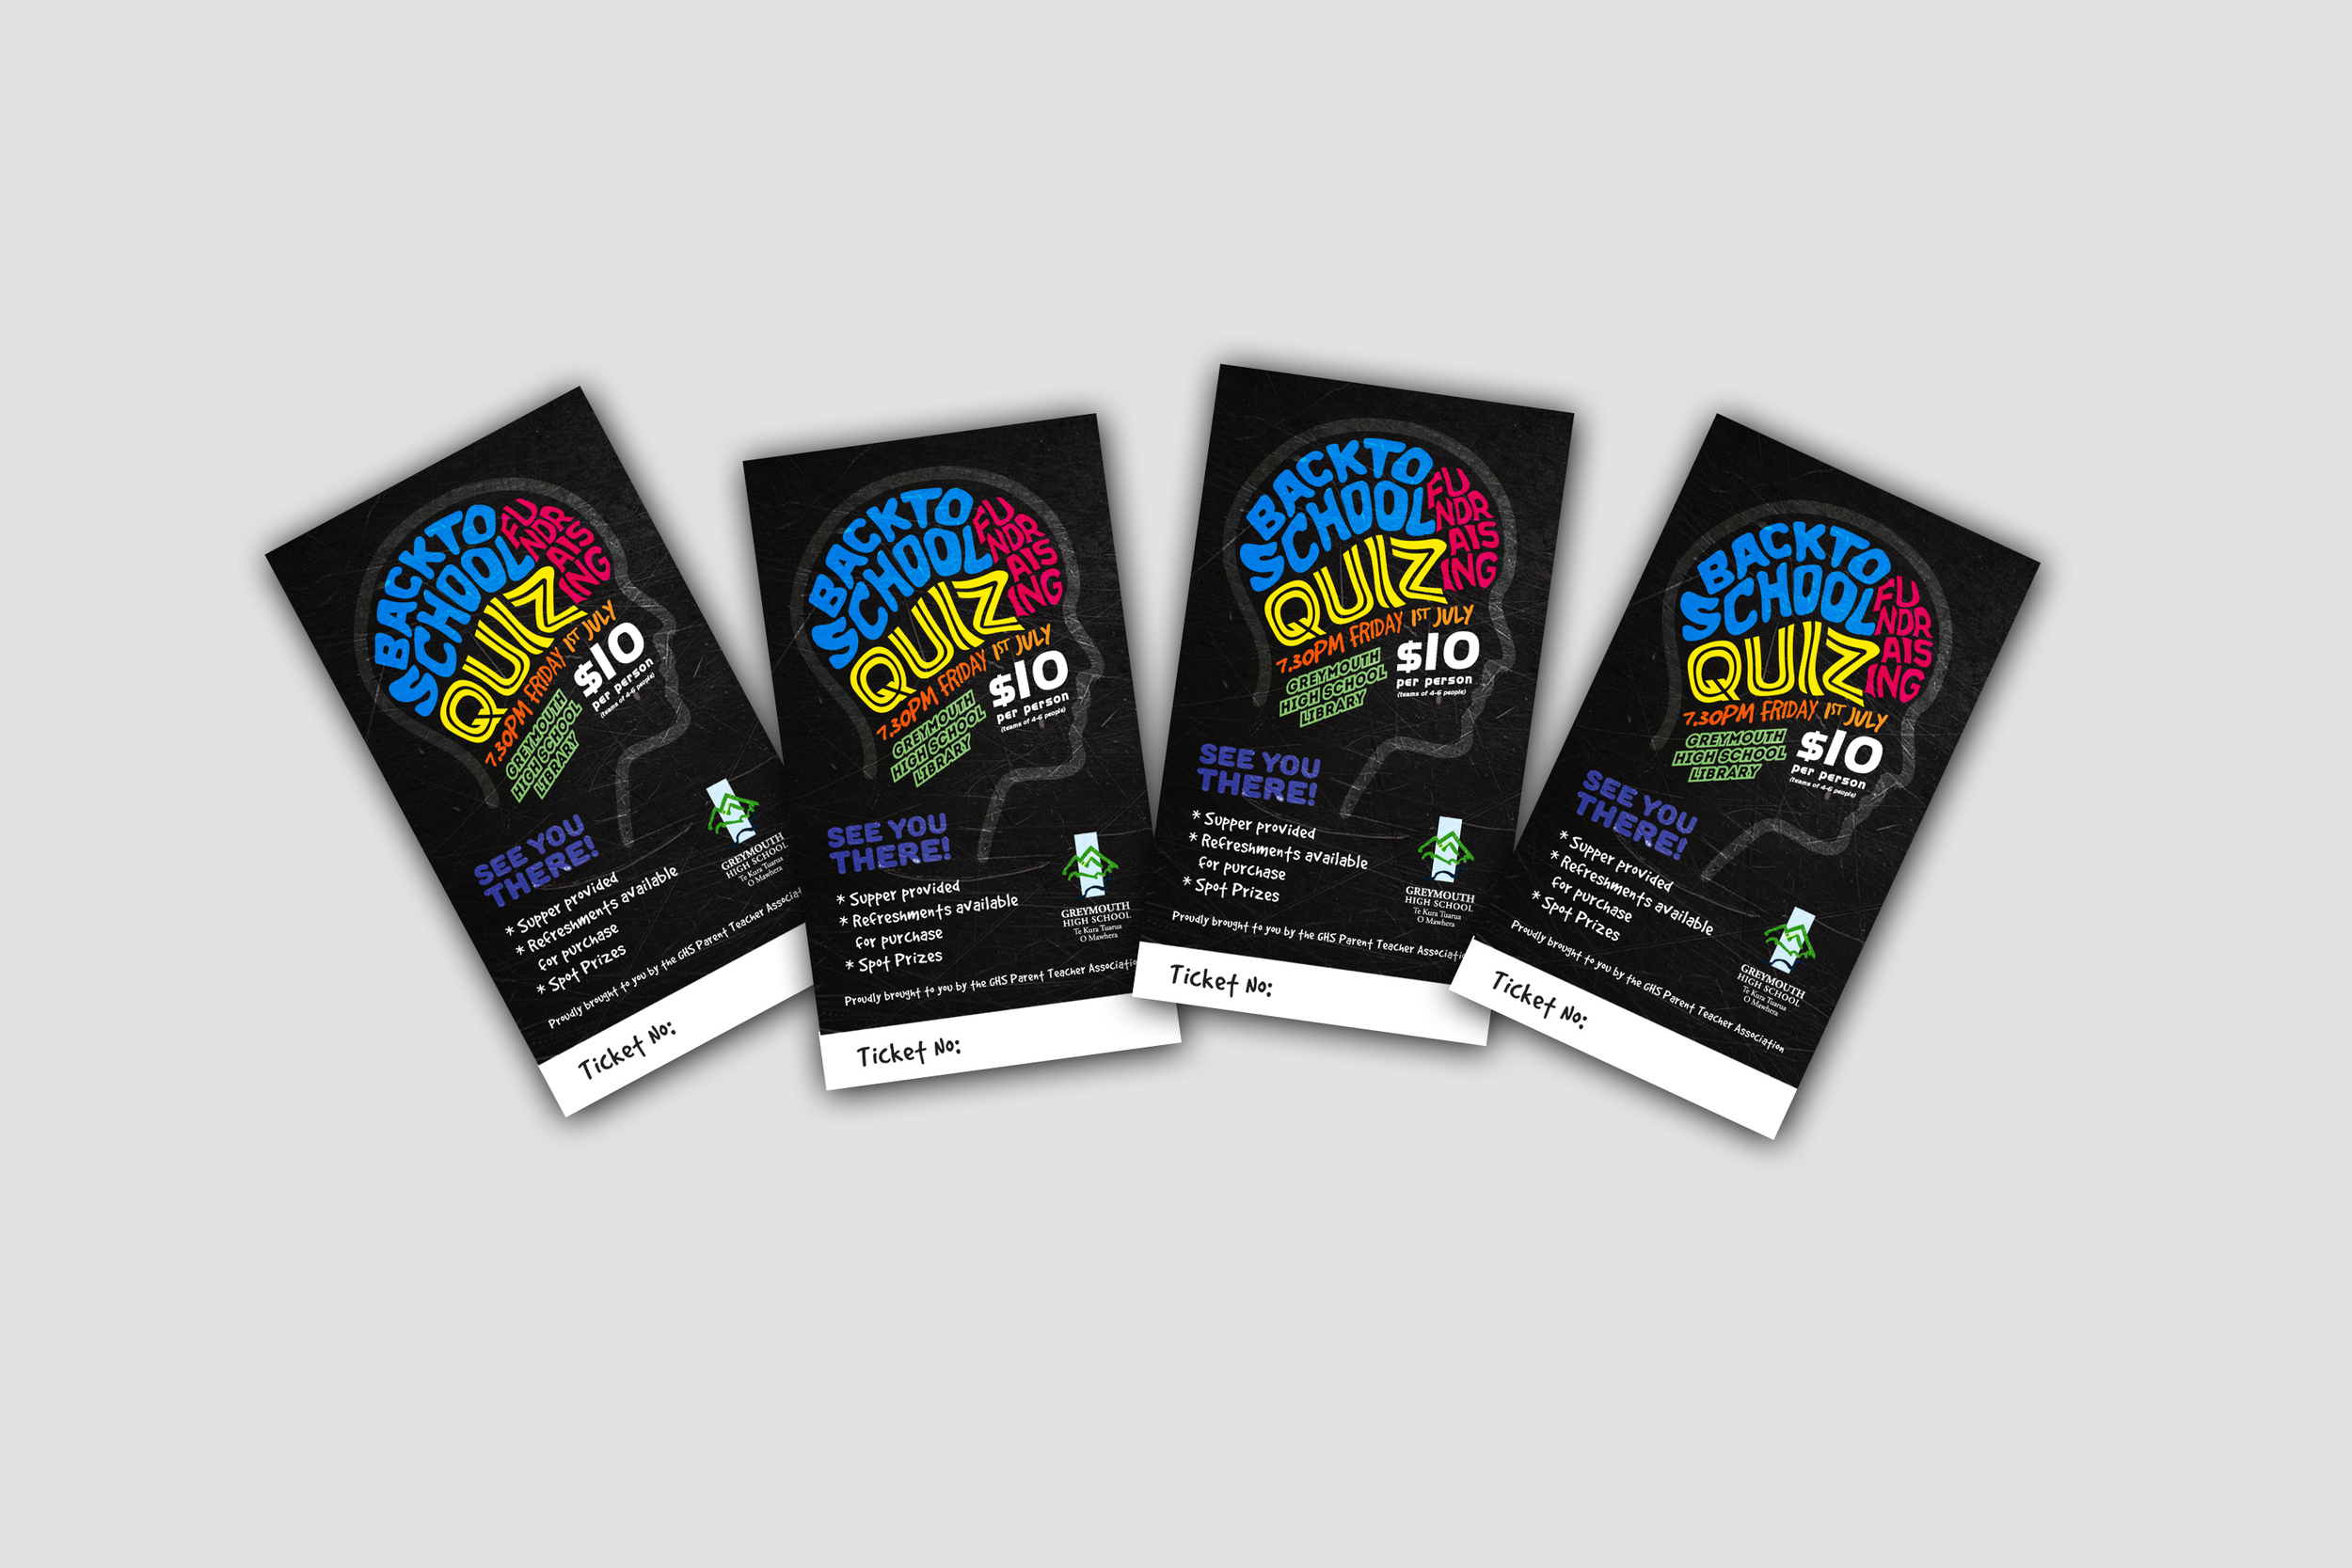 Greymouth High School Quiz Ticket Design